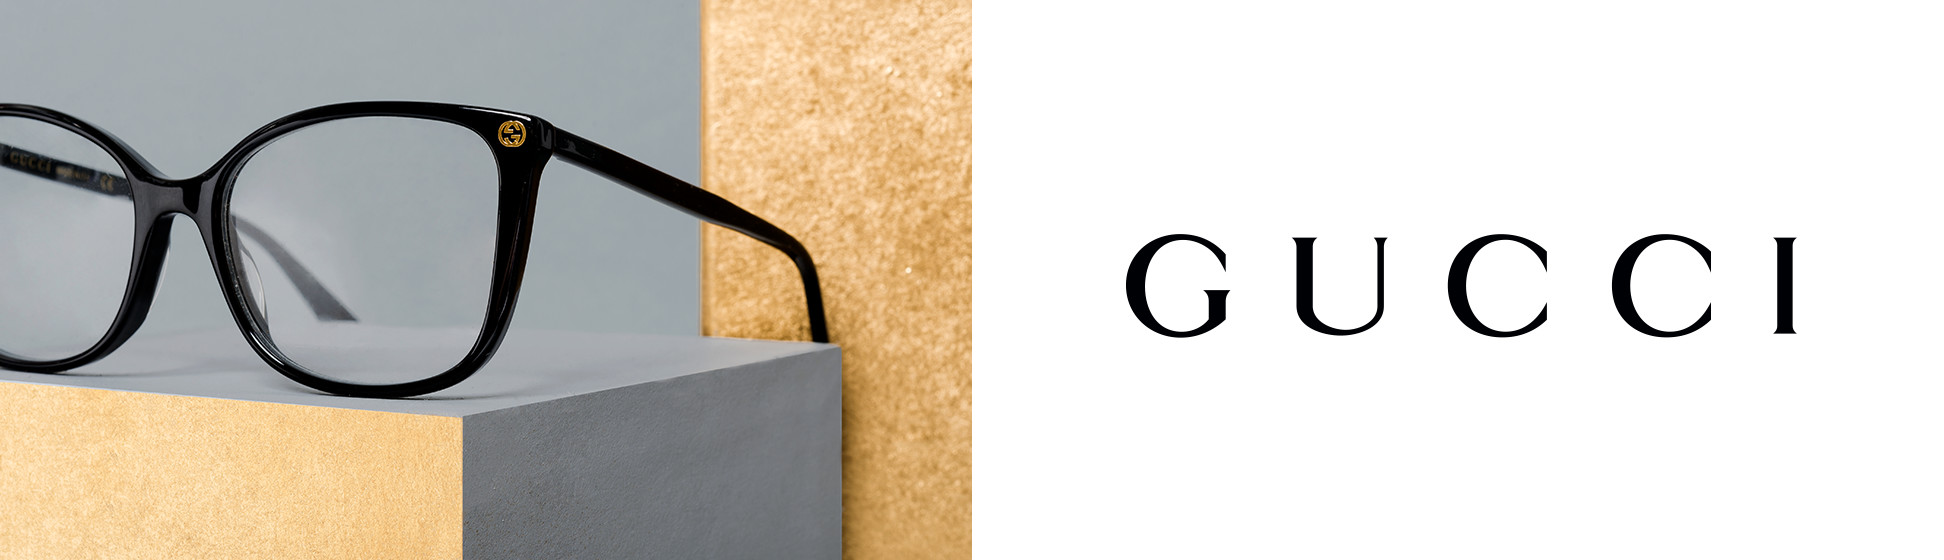 a9a32c038175 Gucci Men s Glasses at Mister Spex UK